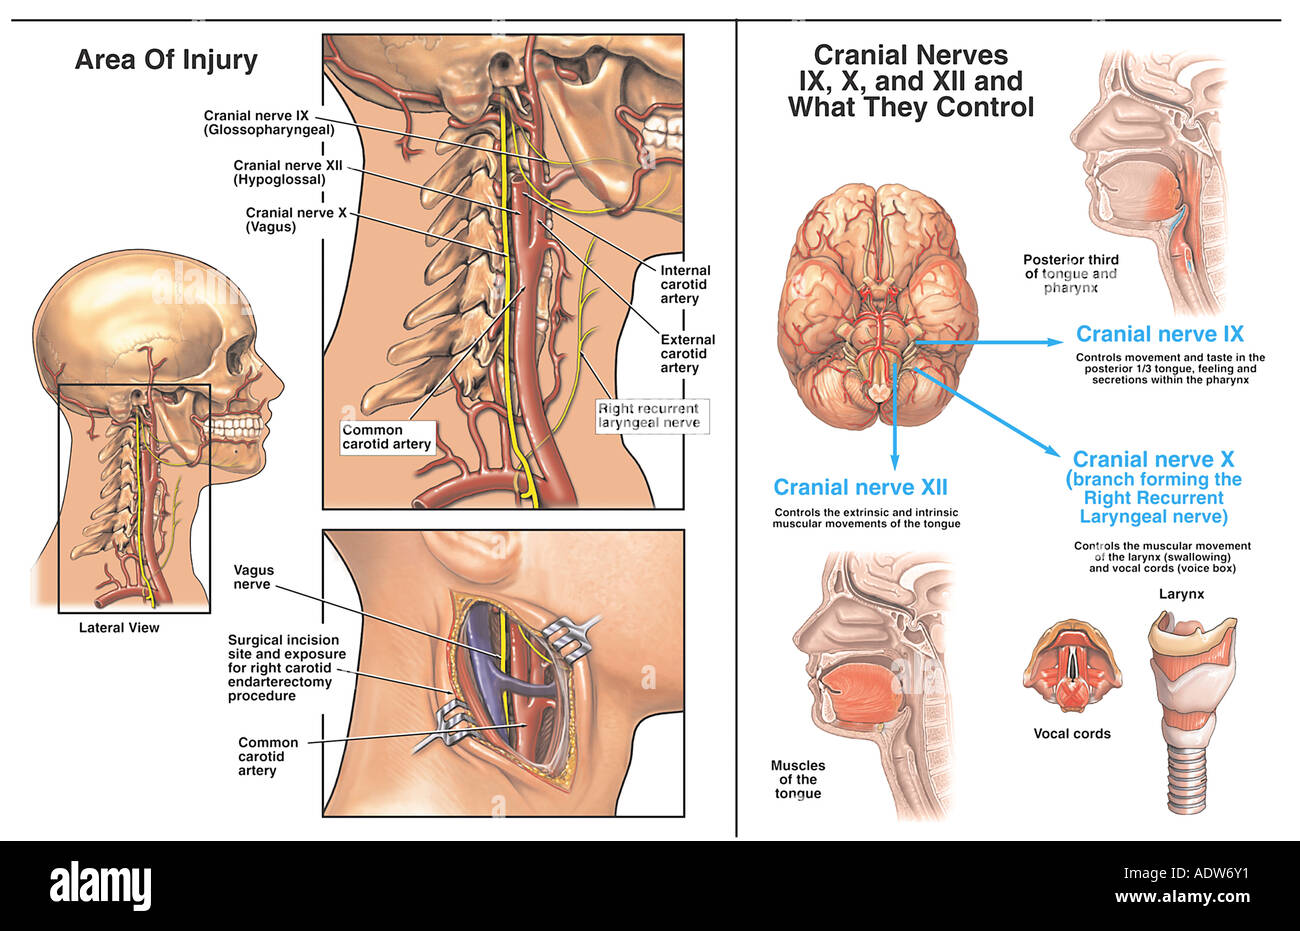 Cranial Nerve Imágenes De Stock & Cranial Nerve Fotos De Stock - Alamy